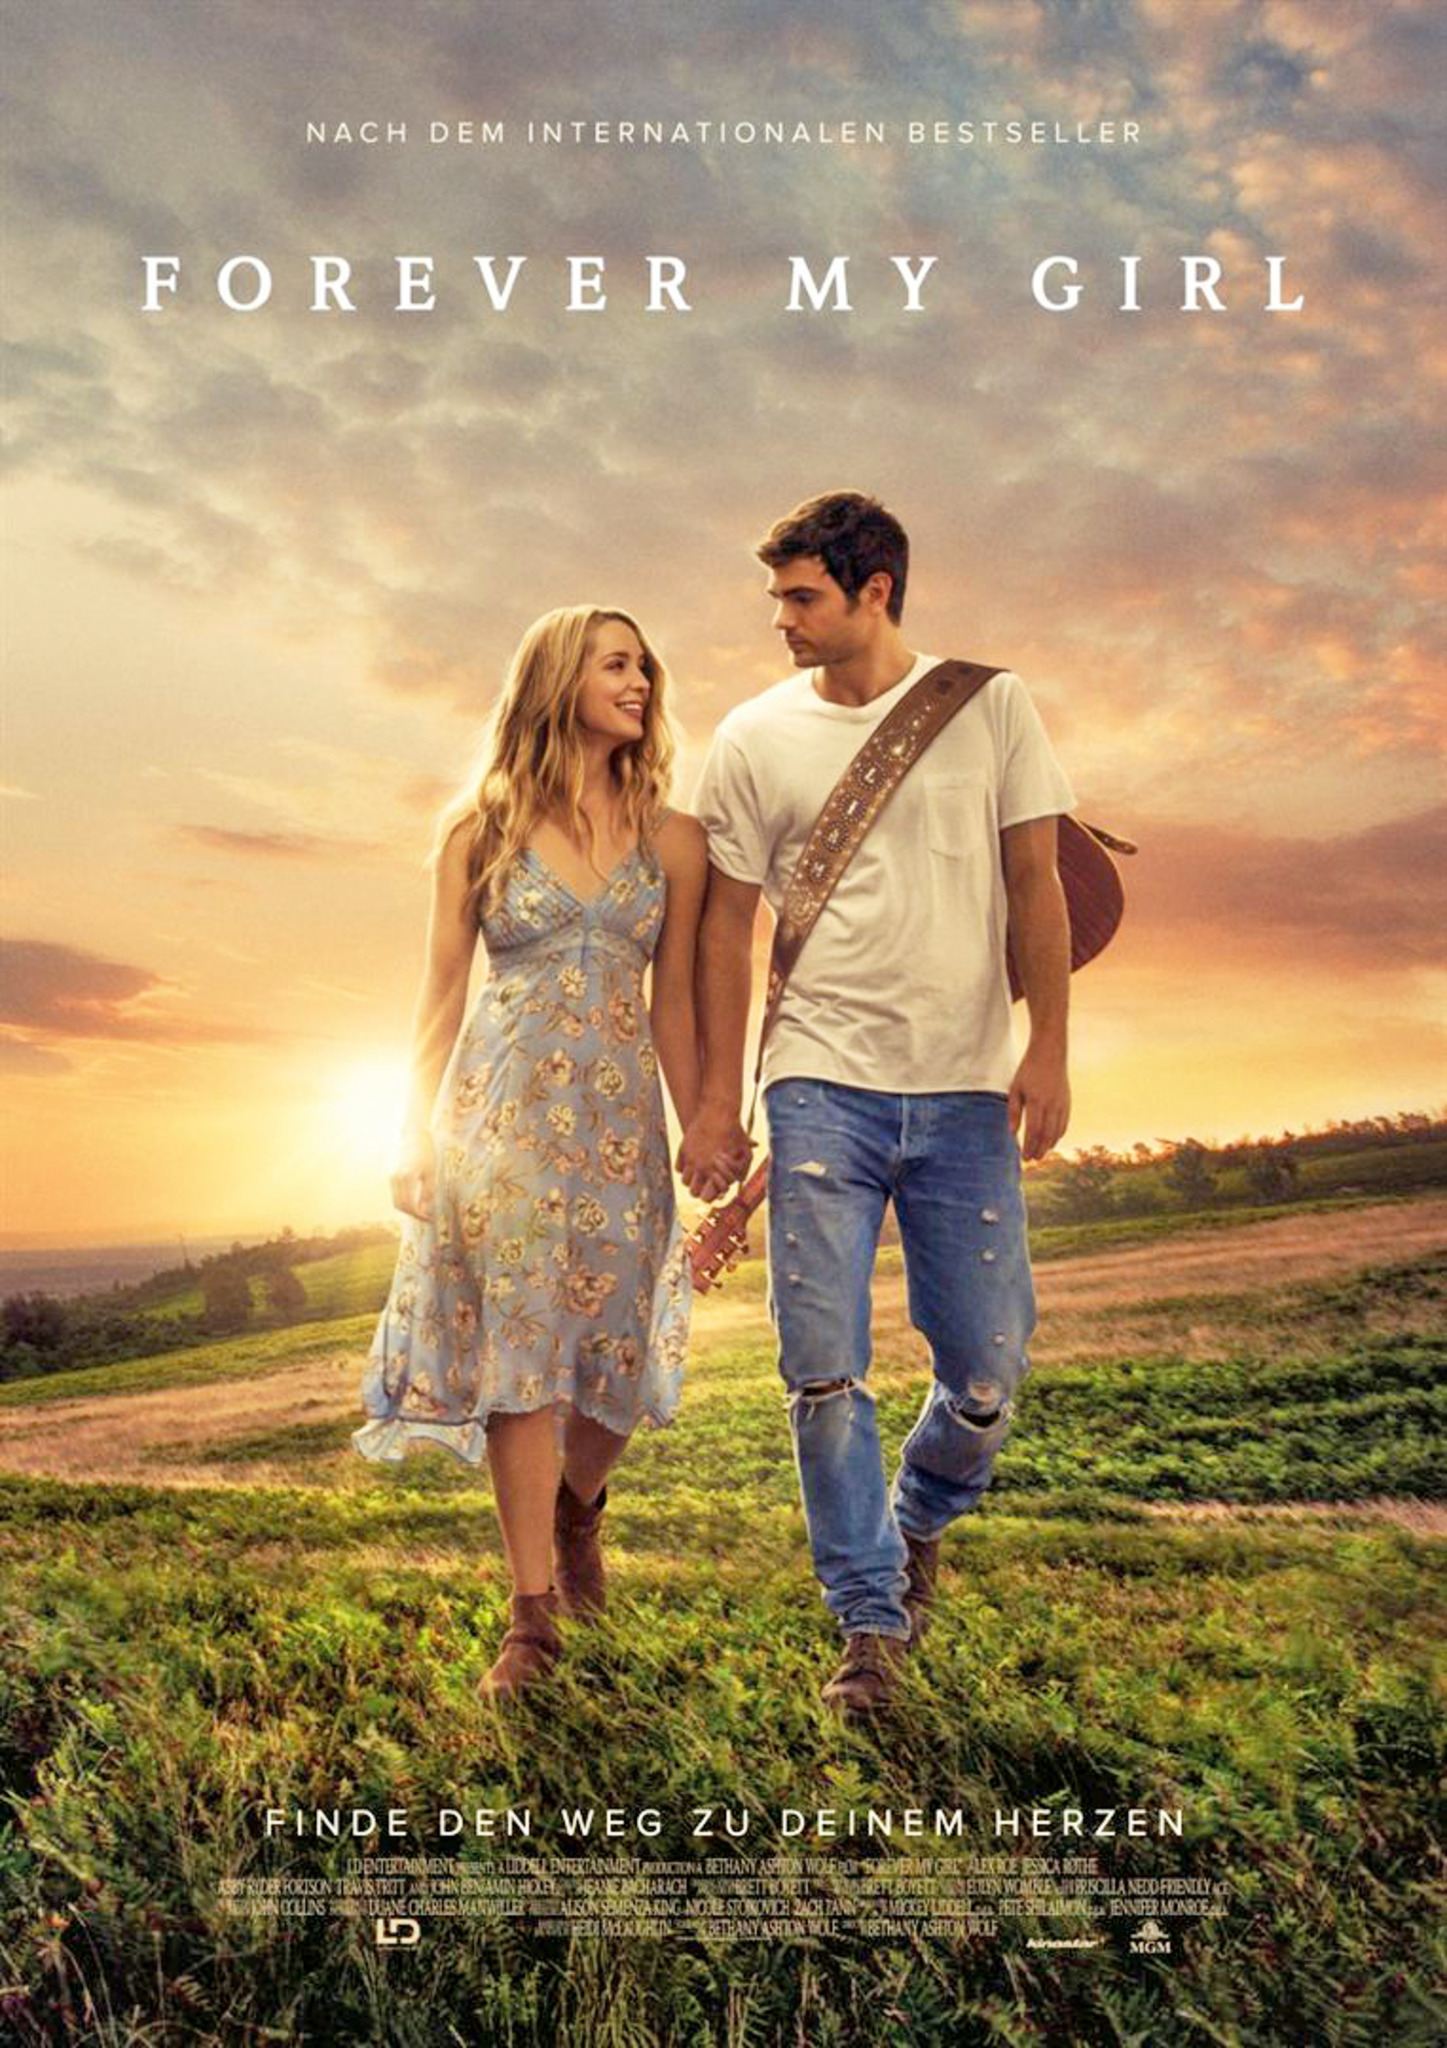 Forever My Girl Startet Am 16 August Im Kino Linz